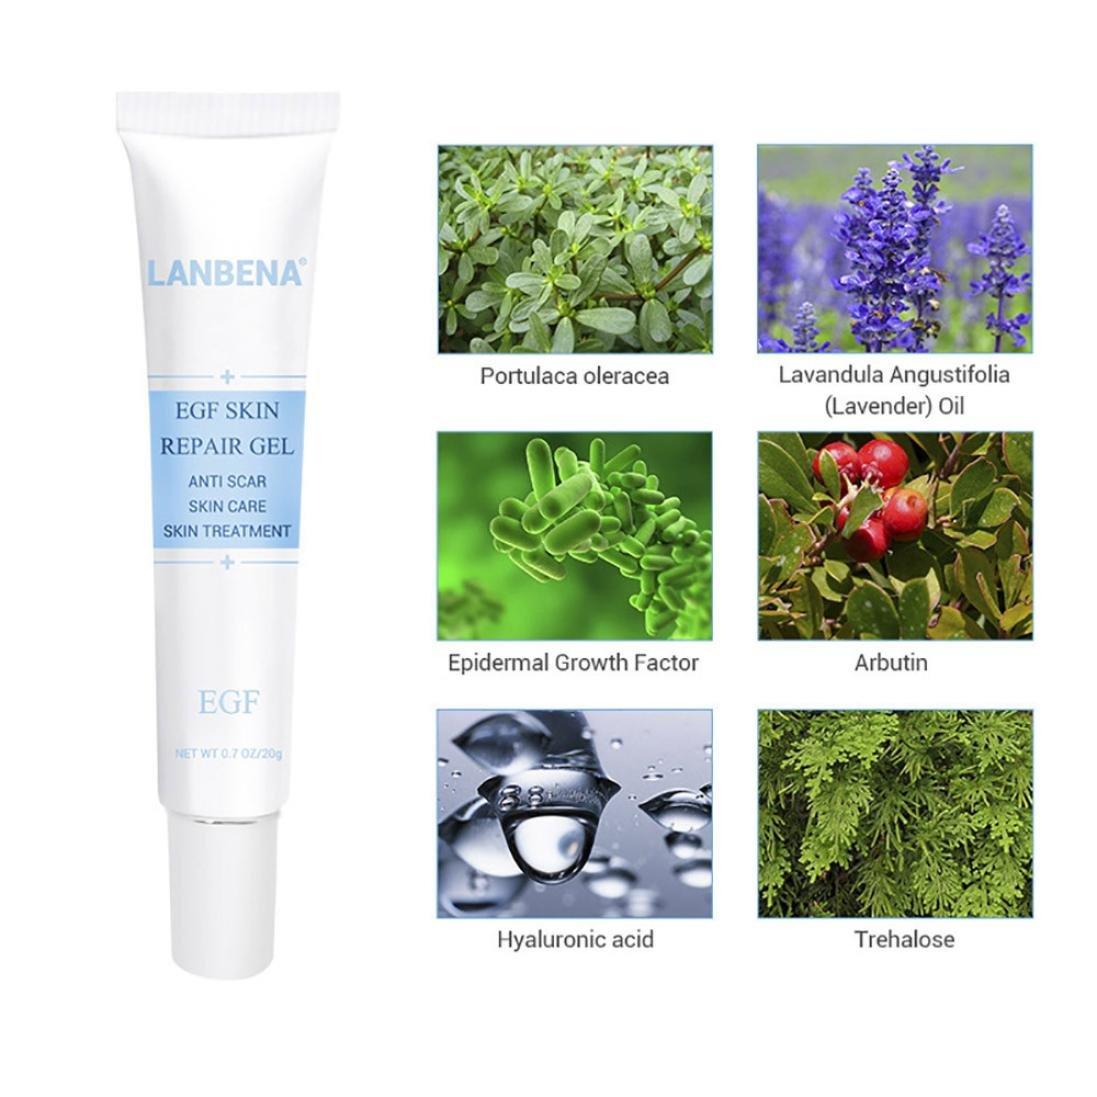 Removing Scar Ointment - Fheaven Acne Scar Removal Cream Skin Repair Face Cream Acne Spot Treatment 30ml by Fheaven (Image #6)